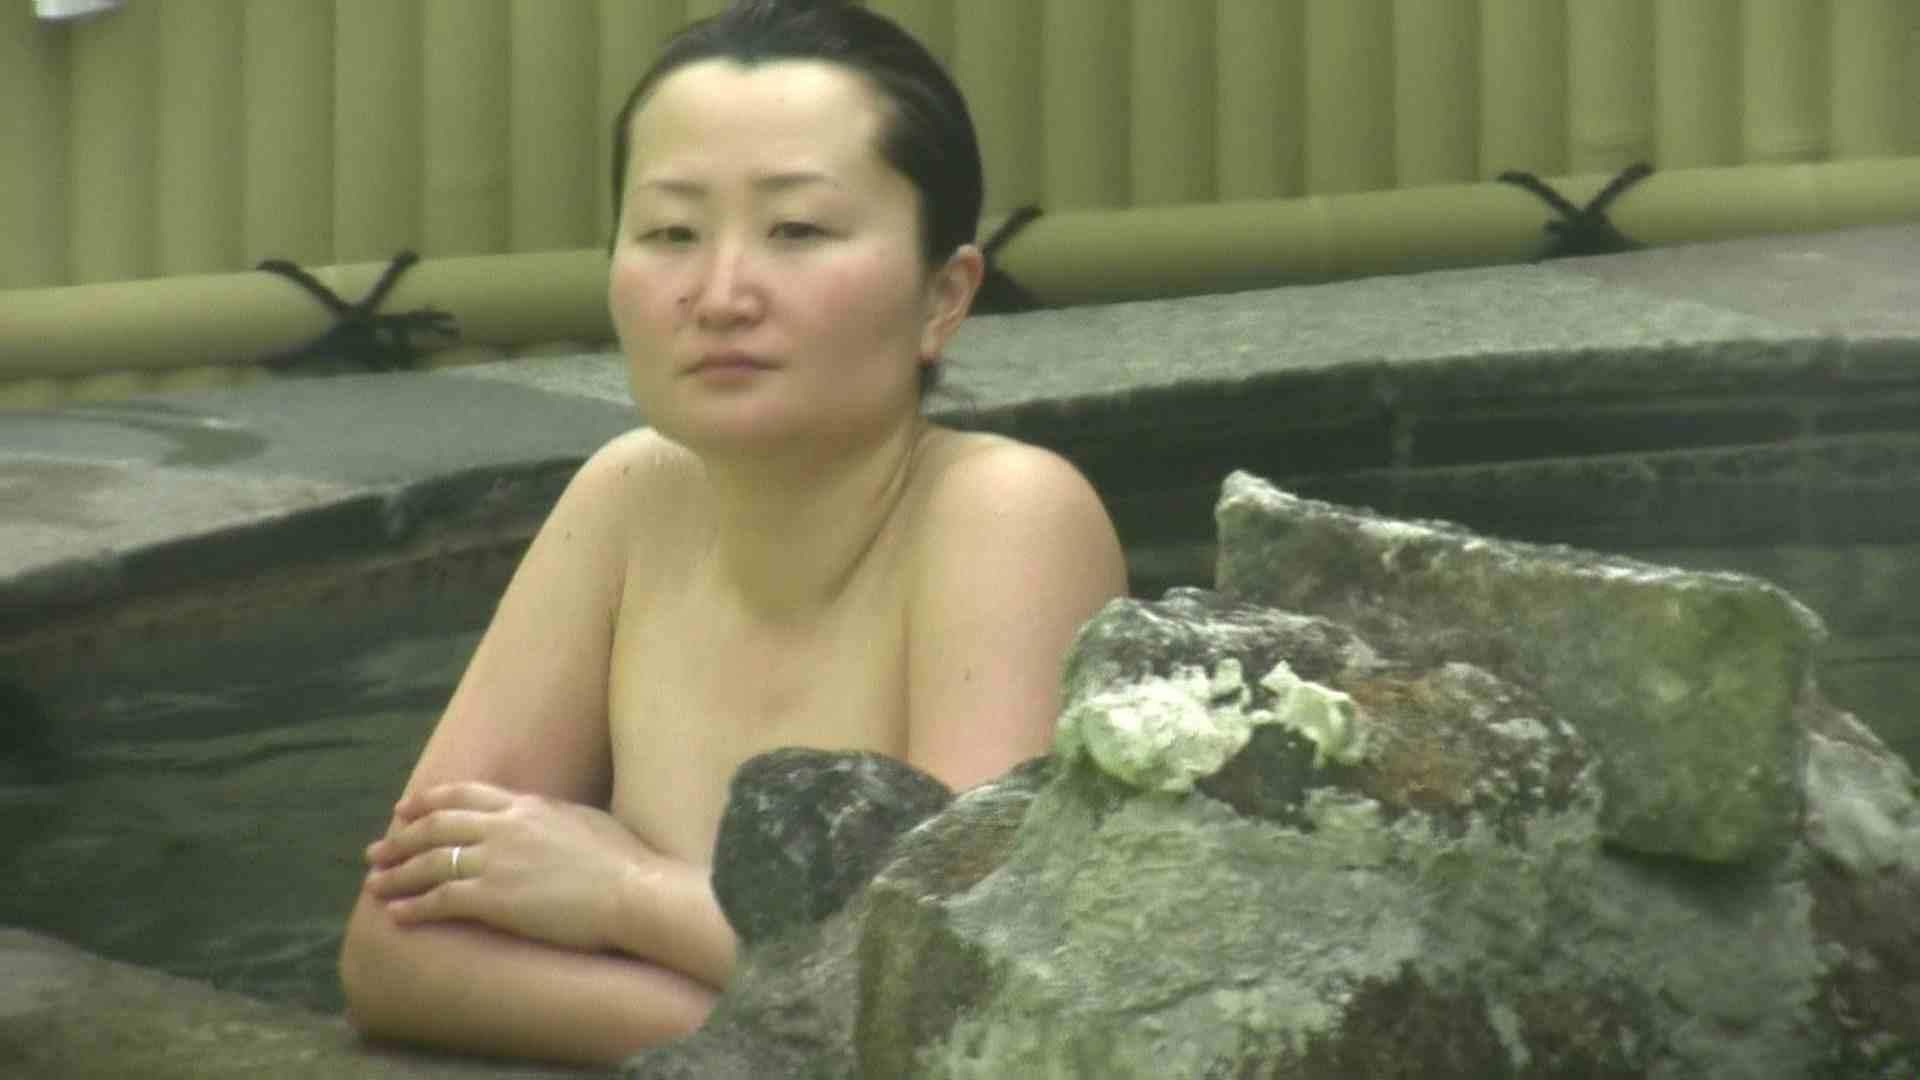 Aquaな露天風呂Vol.632 盗撮 | OLセックス  70画像 40